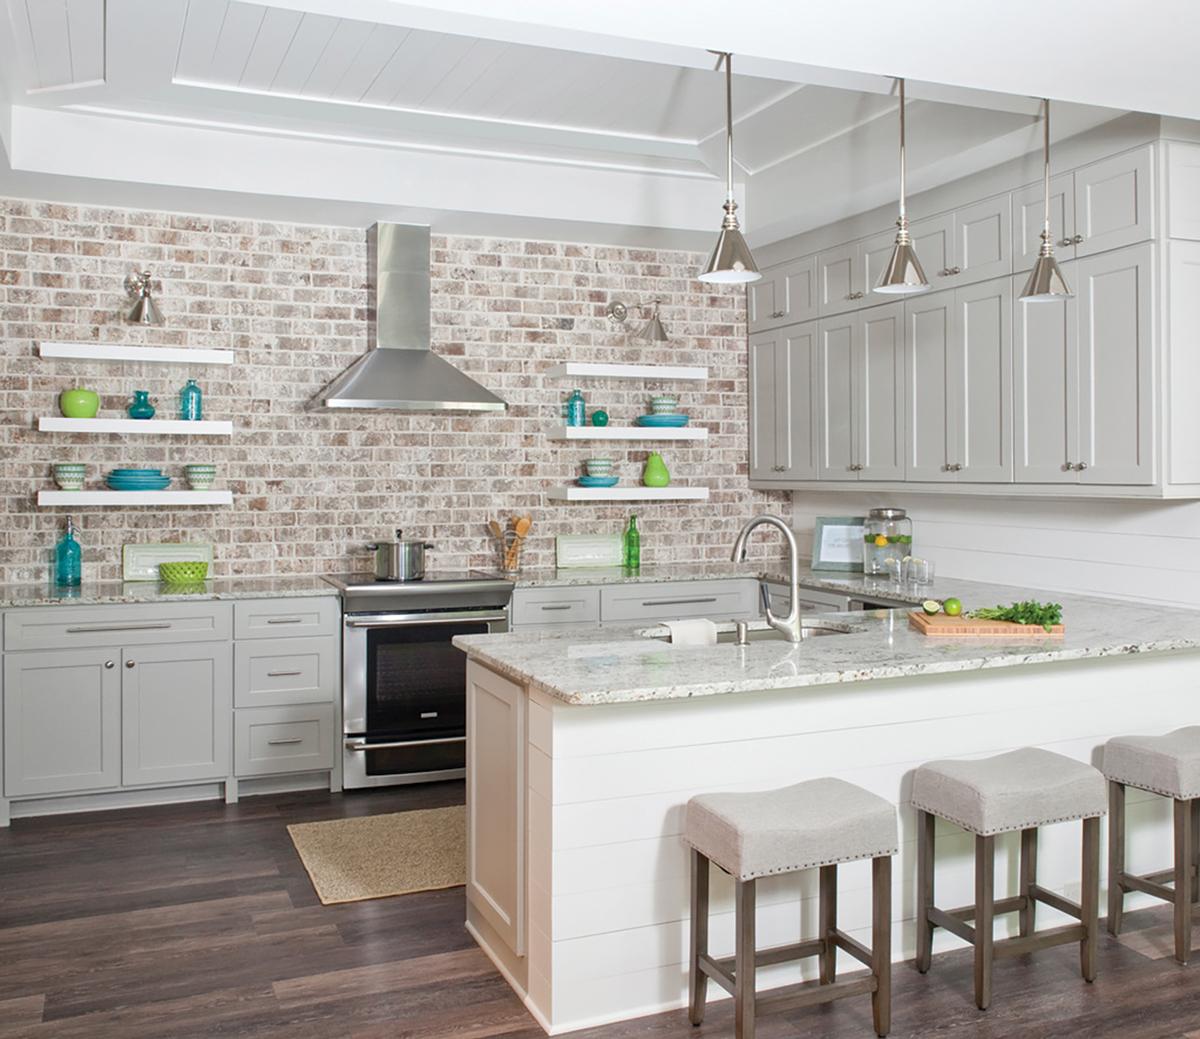 PunjabKesari,स्माल किचन डिजाइन इमेज, small kitchen design image